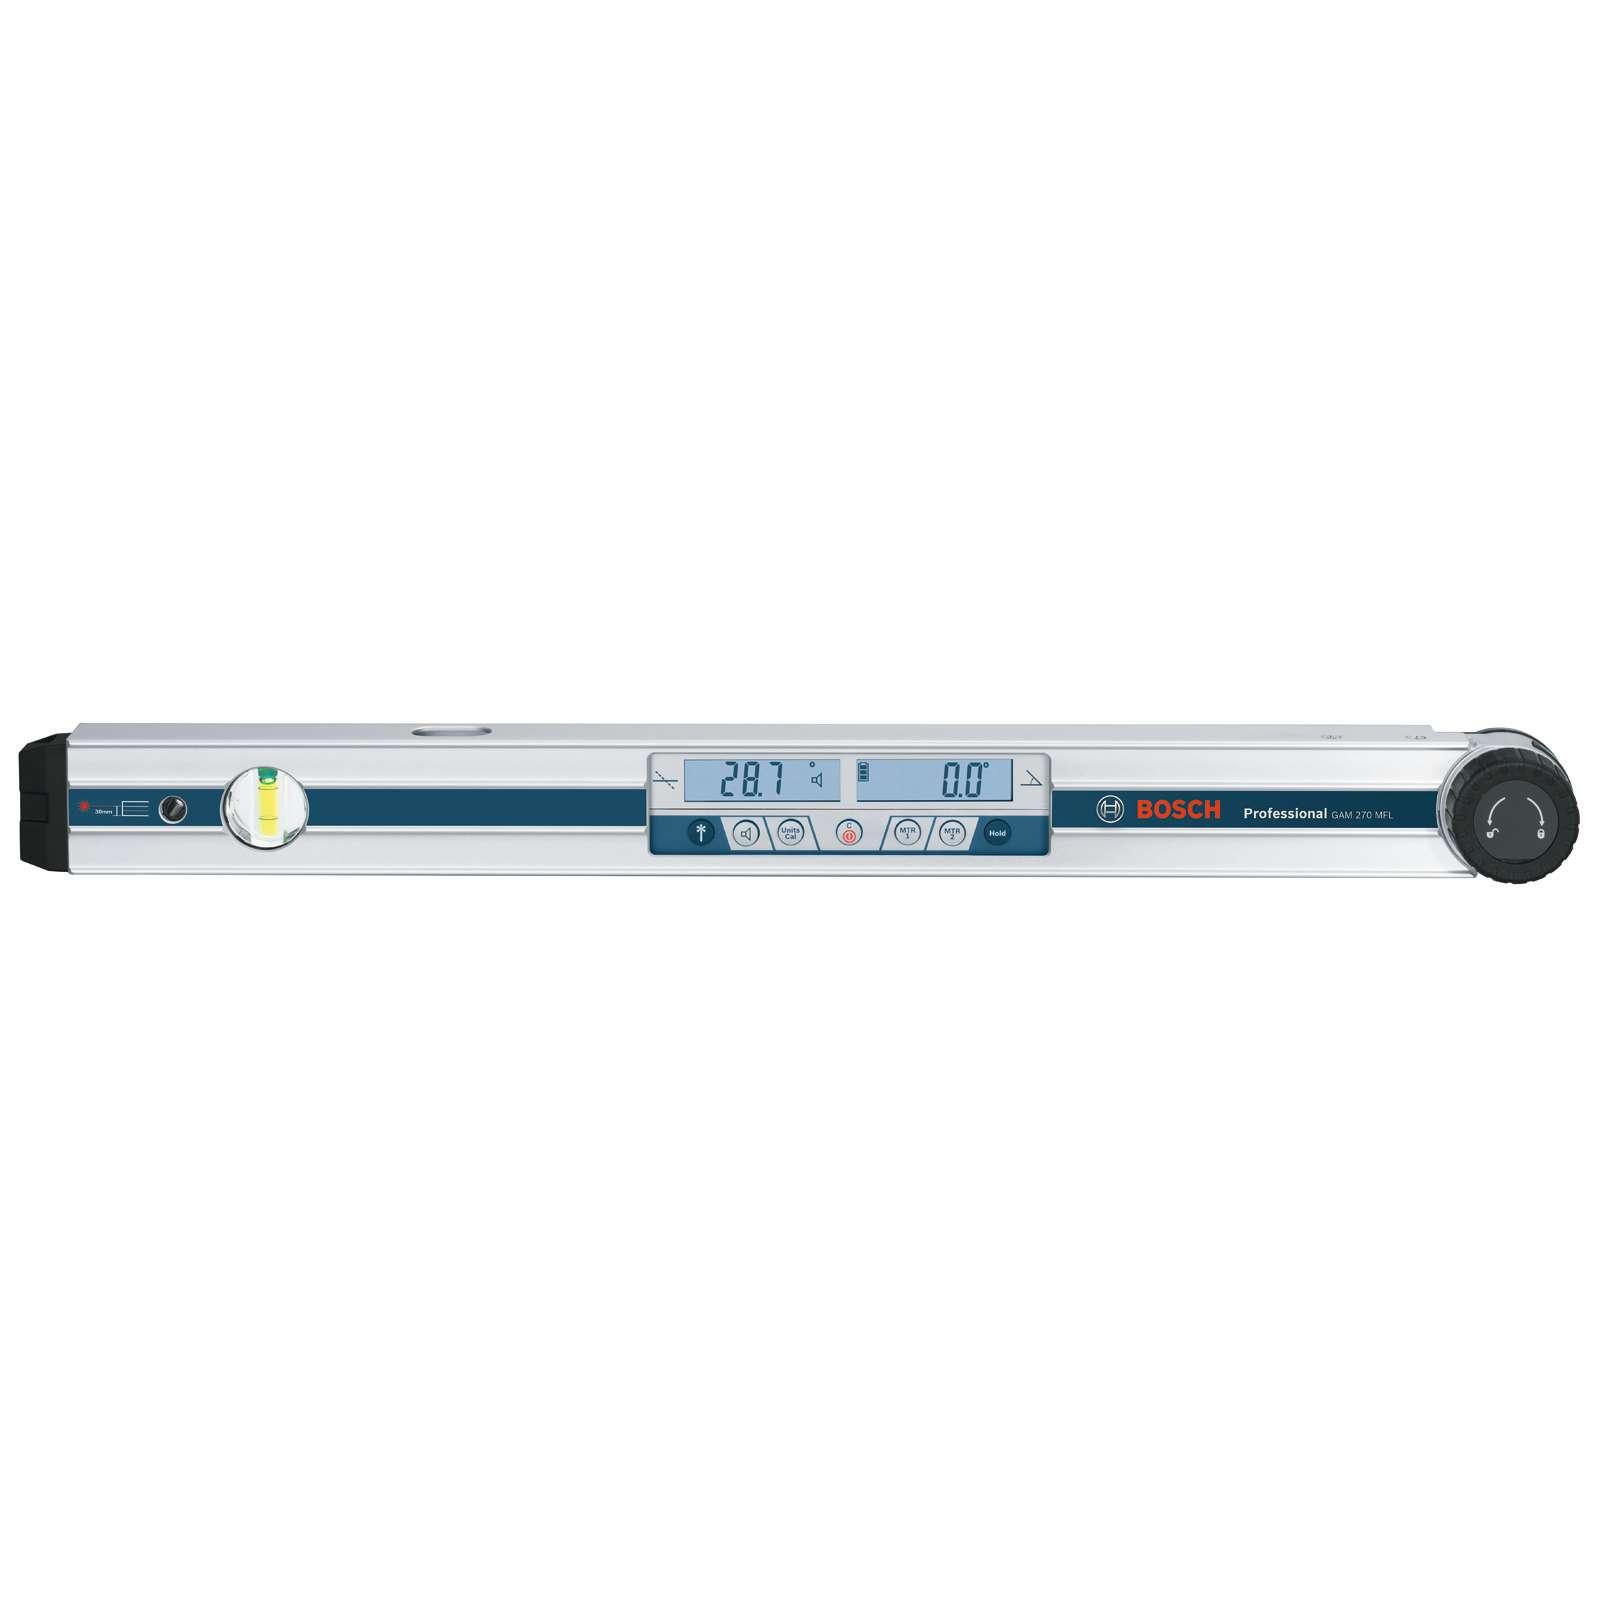 Угломер цифровой Bosch GAM 270 MFL, 60 см